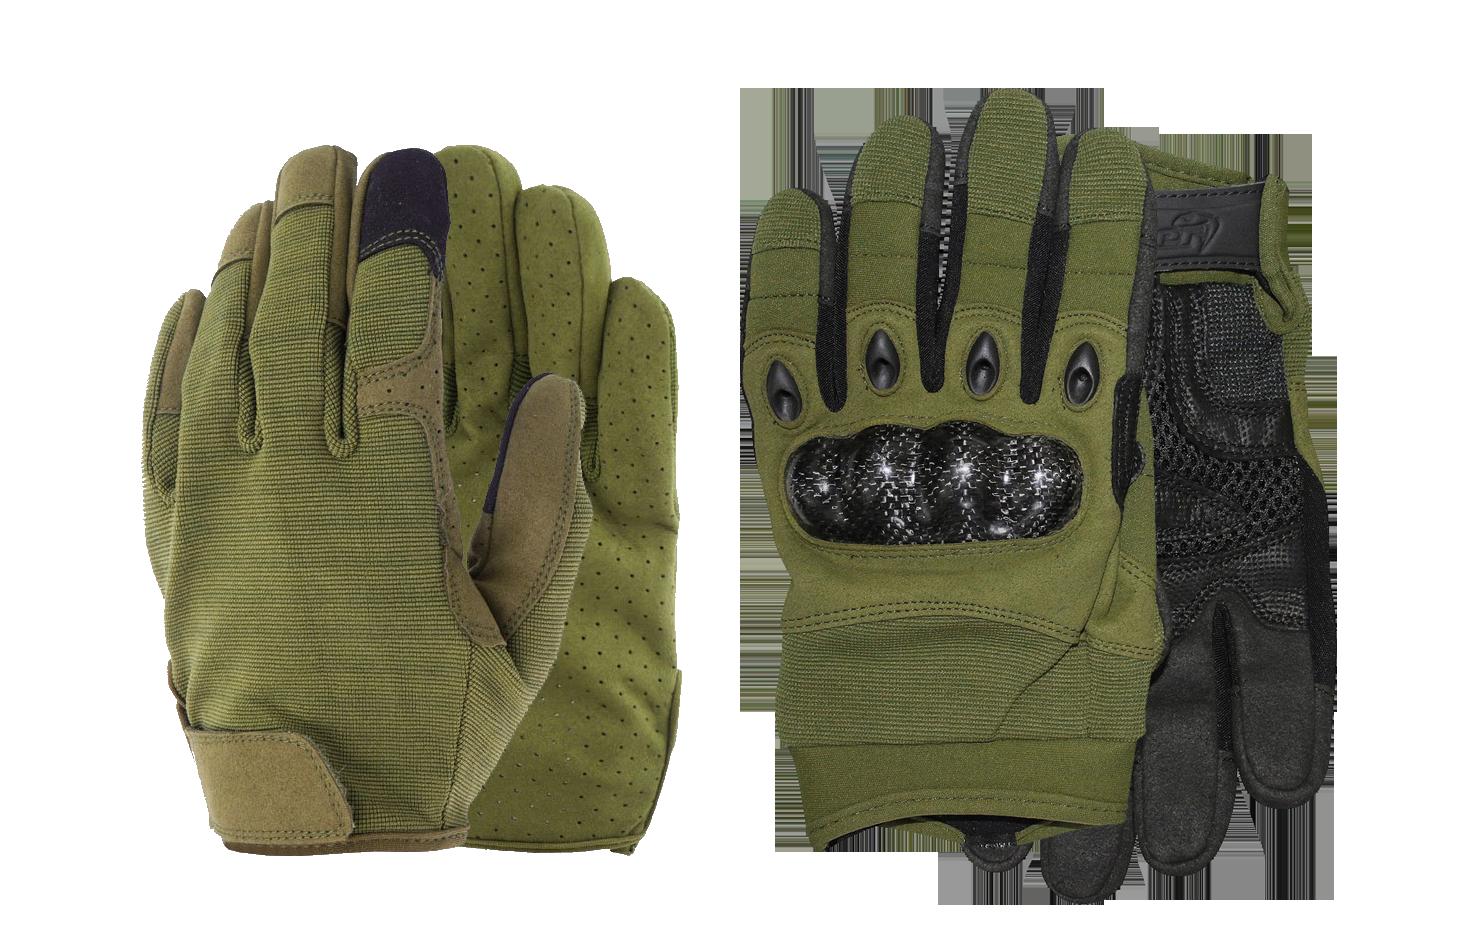 green tactical gloves at bereli